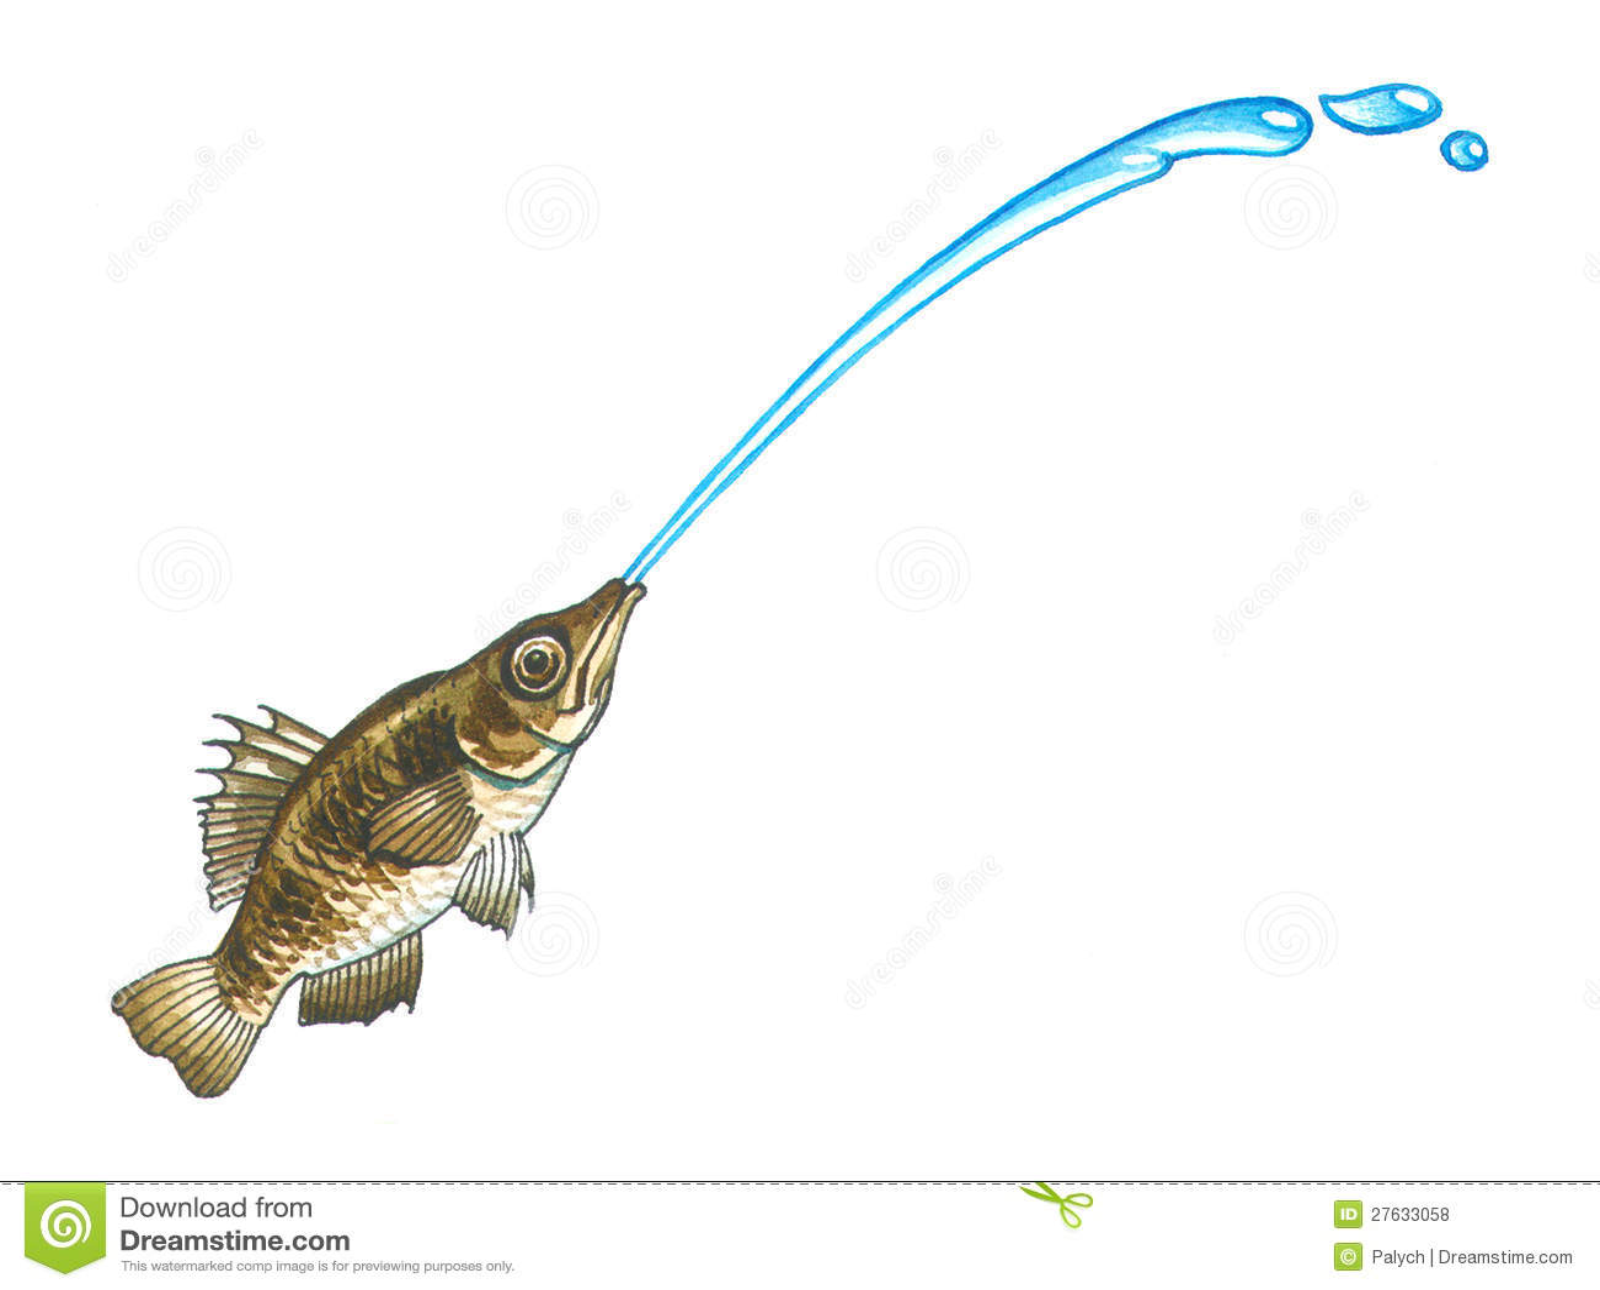 Archerfish (spinner fish or archer fish).